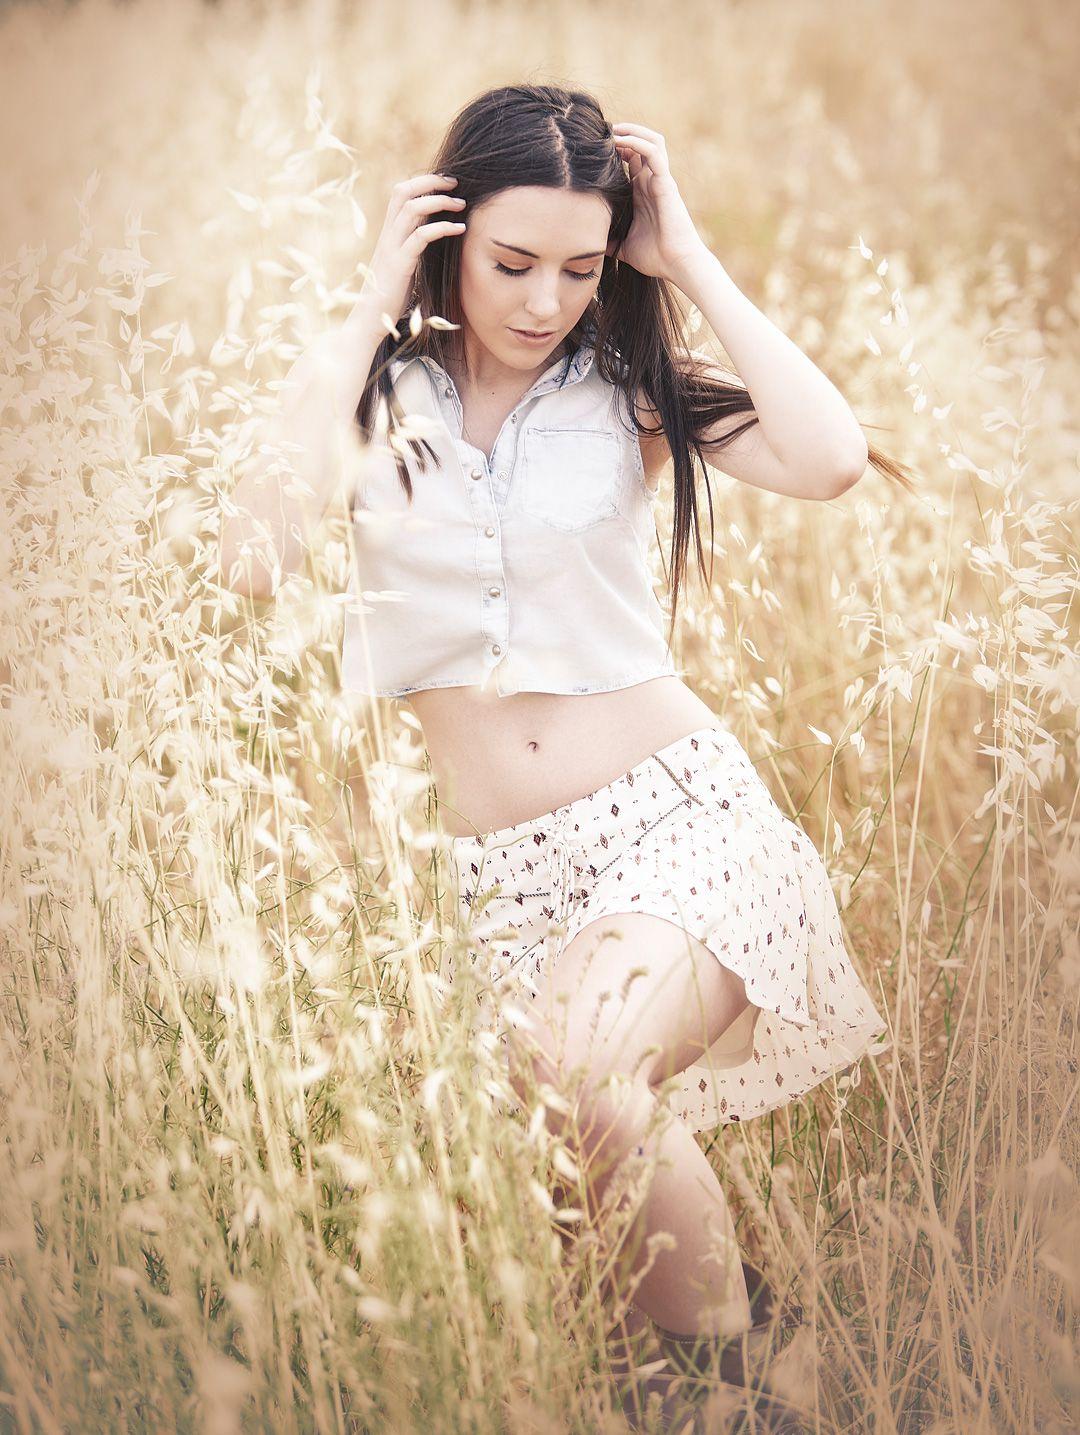 Book para modelos profesionales, ROMANTIC SESSION de Cristina